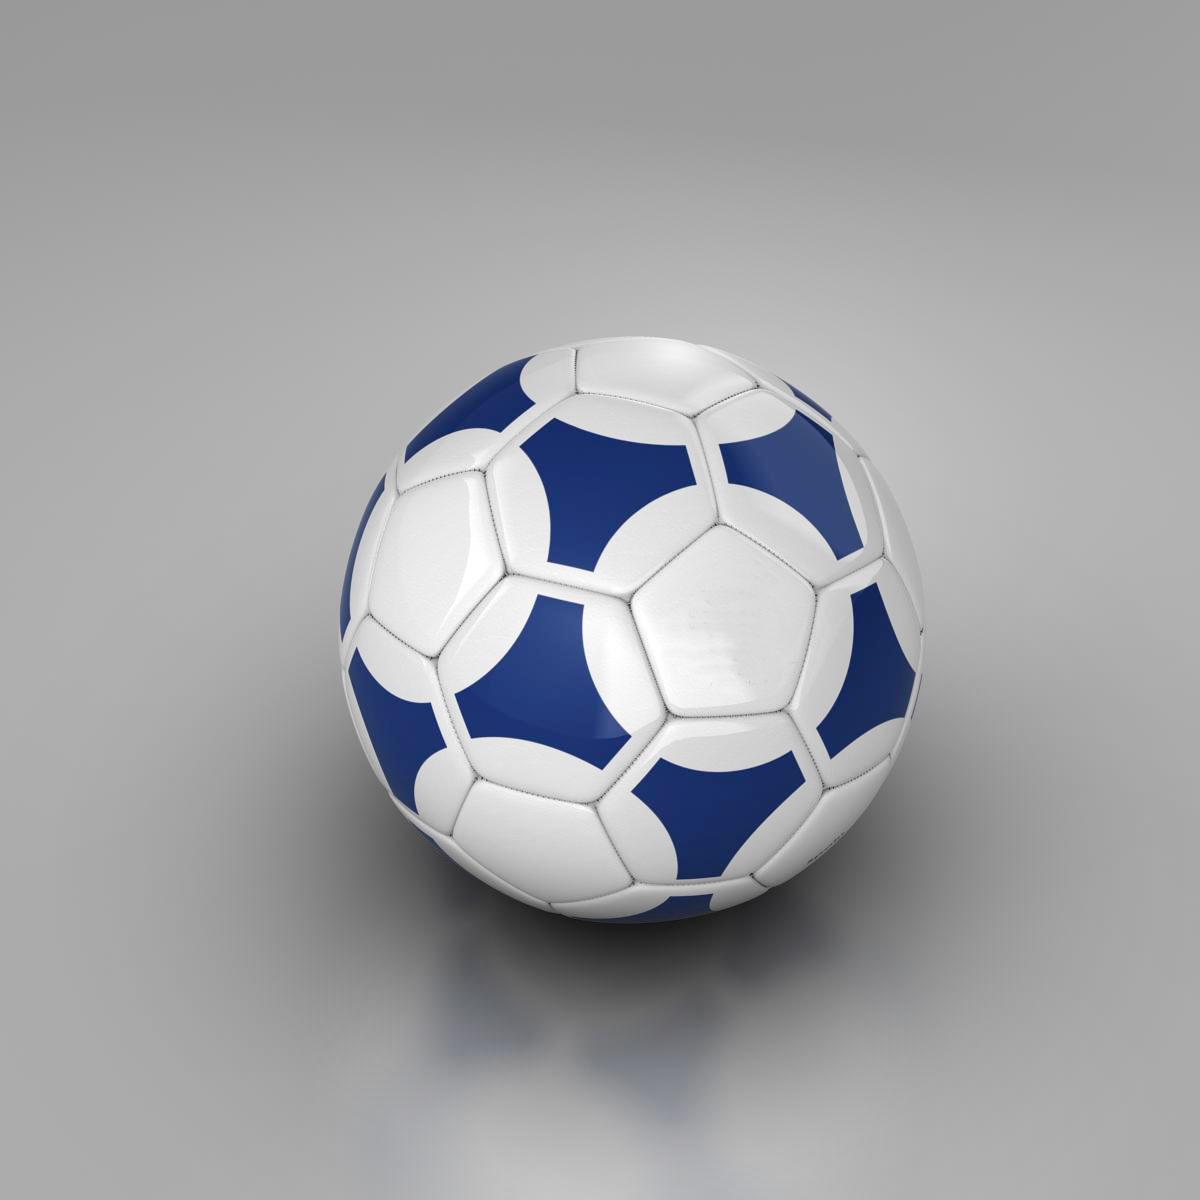 soccerball цэнхэр цагаан 3d загвар 3ds max fbx c4d ma mb obj 203983